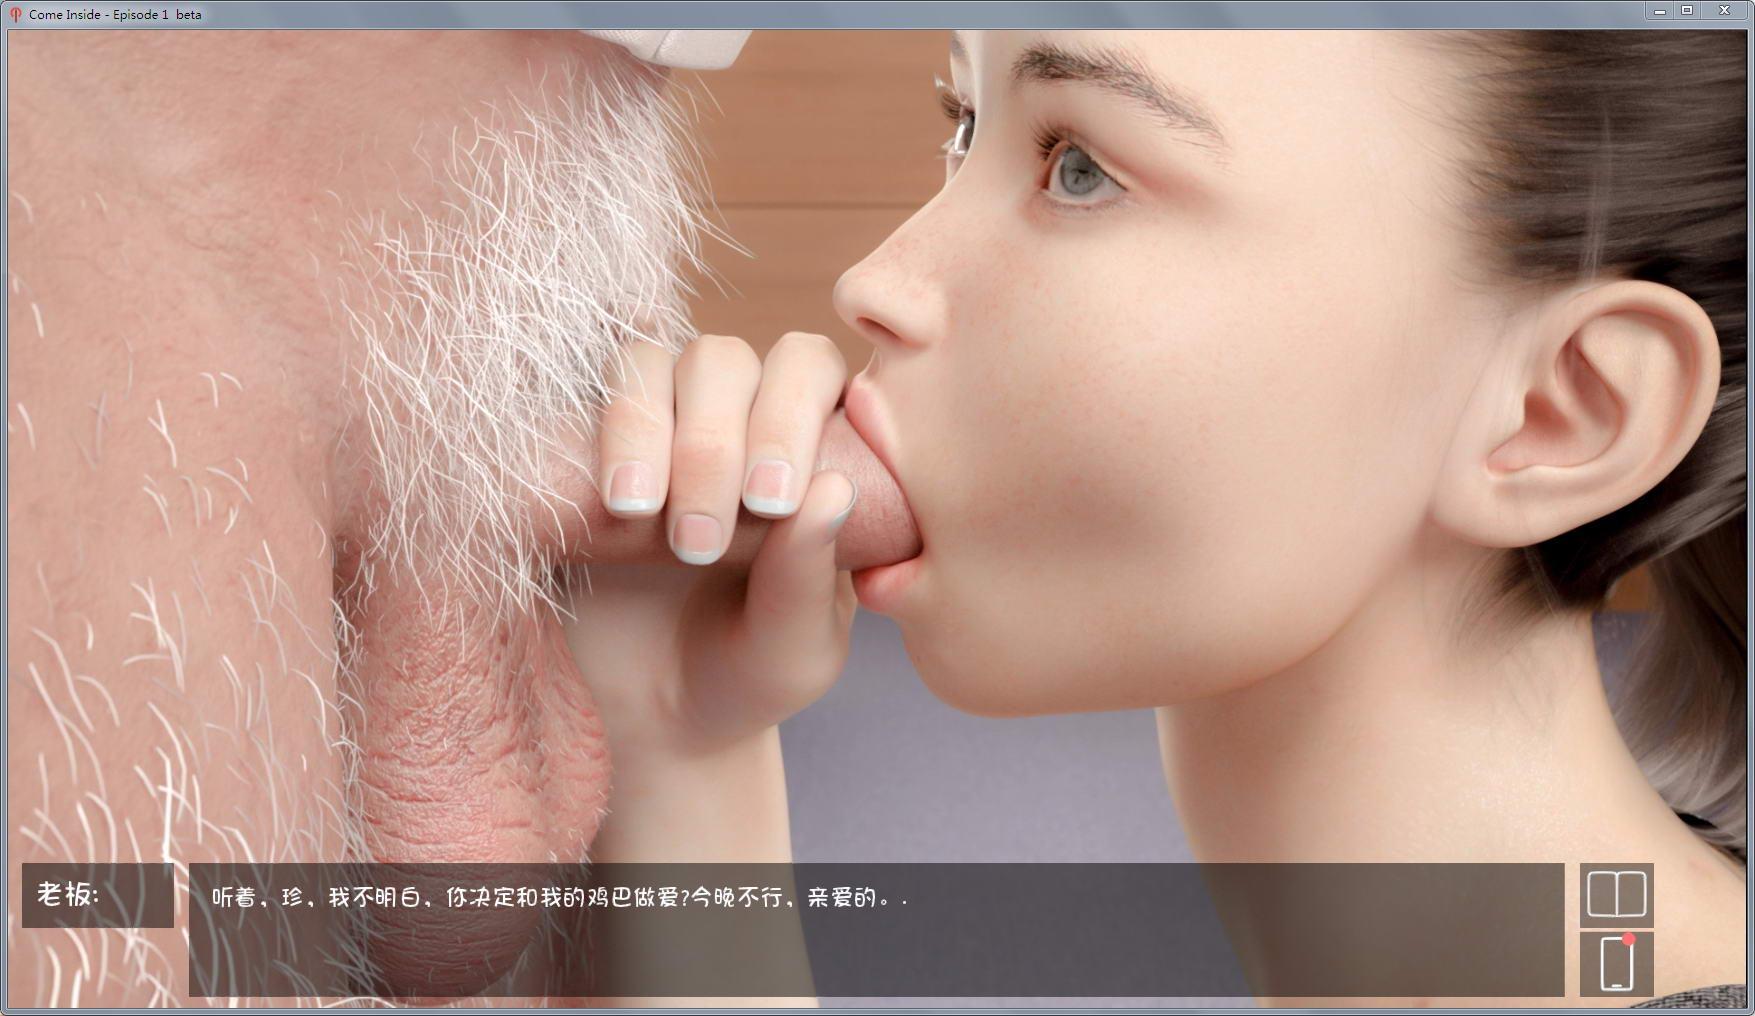 【SLG/汉化/动态CG】深化交流 Ver0.1 汉化版+全CG【新汉化/精巧】【PC+安卓】【2G】